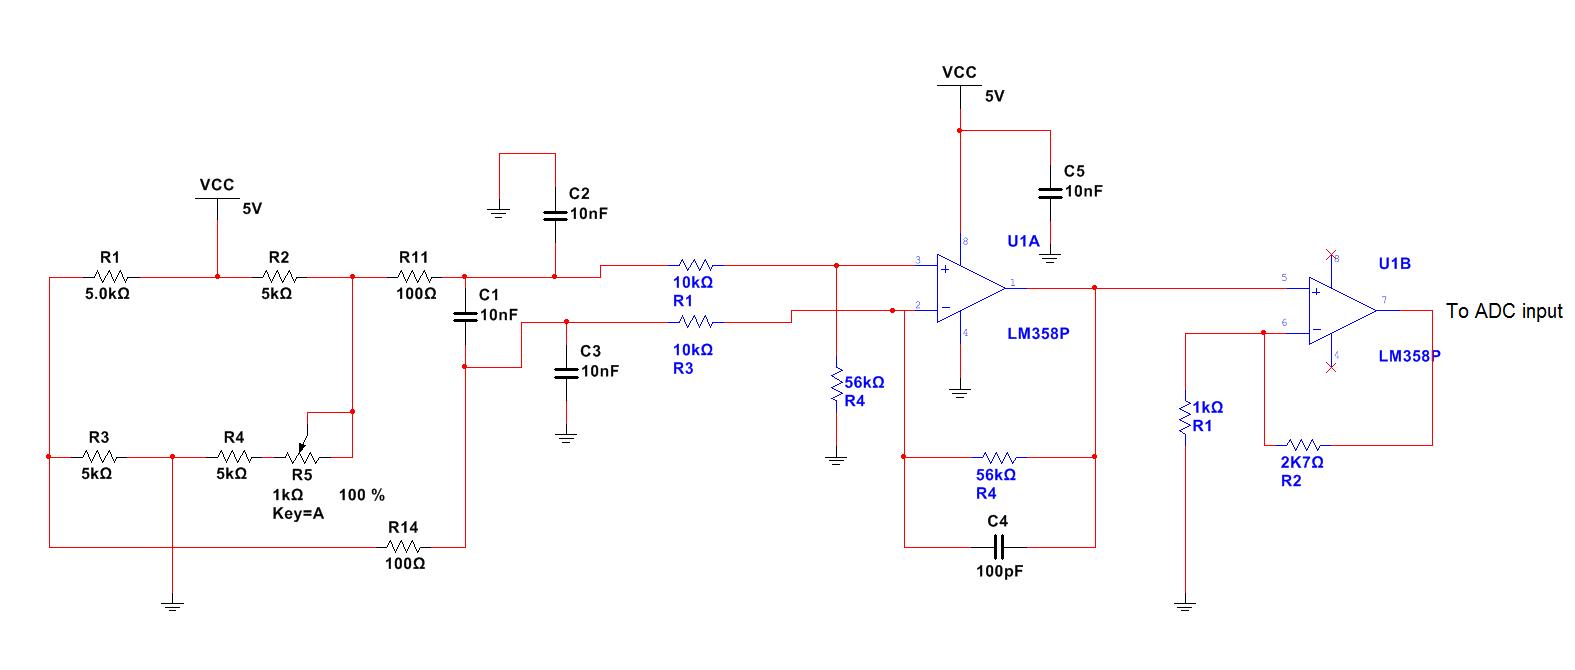 How To De Couple Dmx512 With Opto Isolators also Arduino Smoke Detector On Pcb Using Mq2 Gas Sensor also 388426 likewise Arduino Uno Cnc Wiring Diagram in addition Elegoo L298n Dual H Bridge Stepper Dc Motor Driver Shield Expansion Development Board. on arduino shield schematic diagram